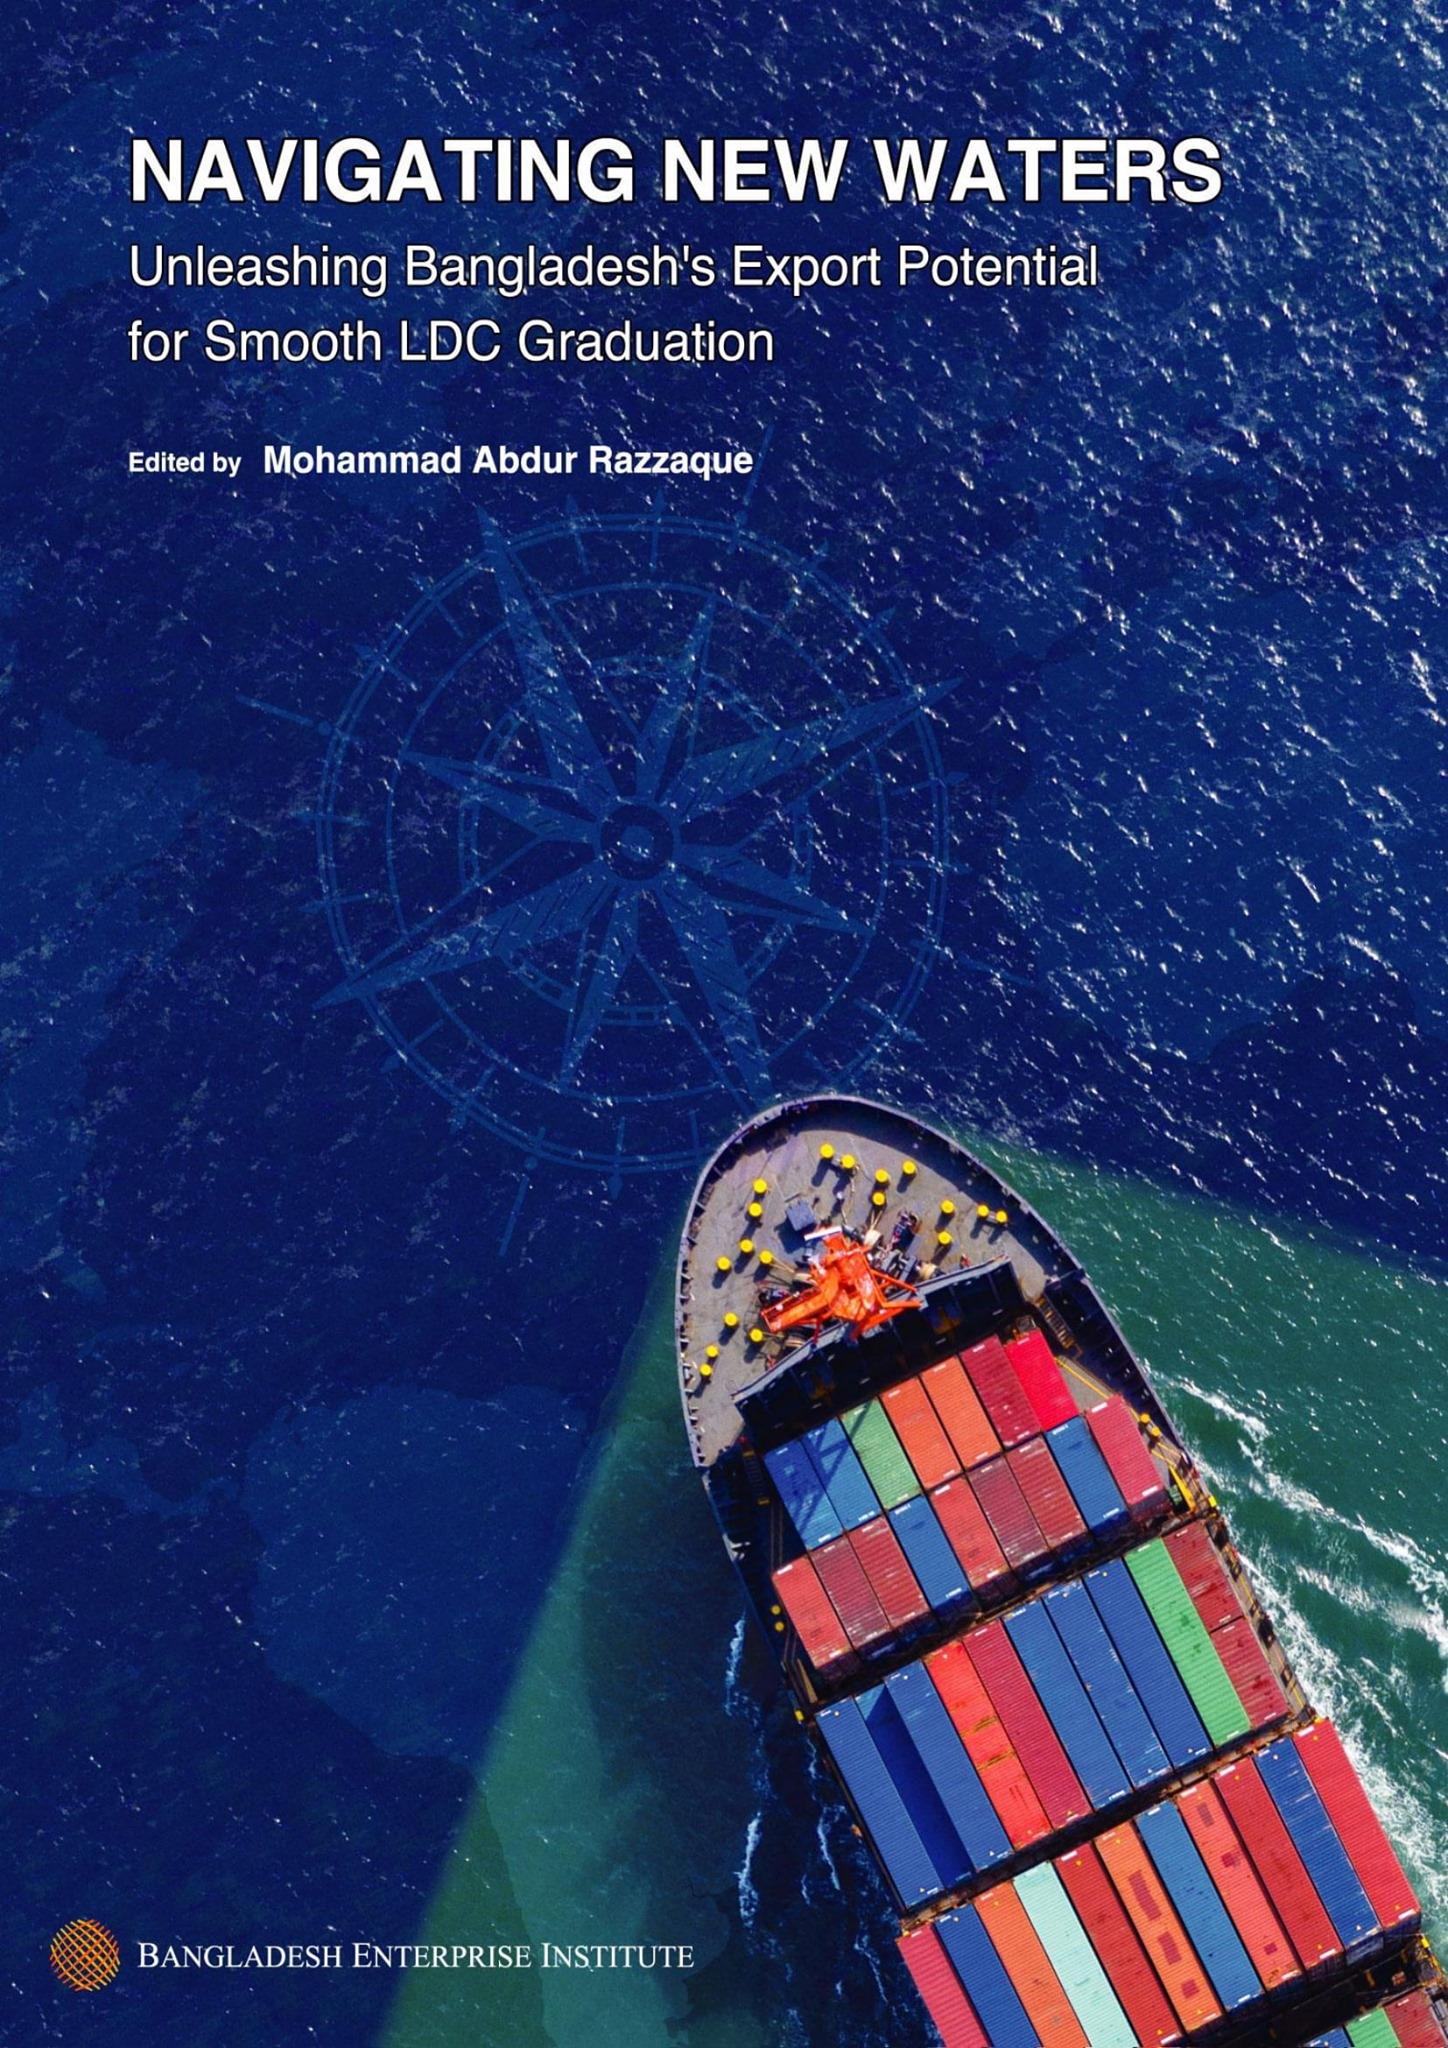 Looking at Graduation from LDC and way forward